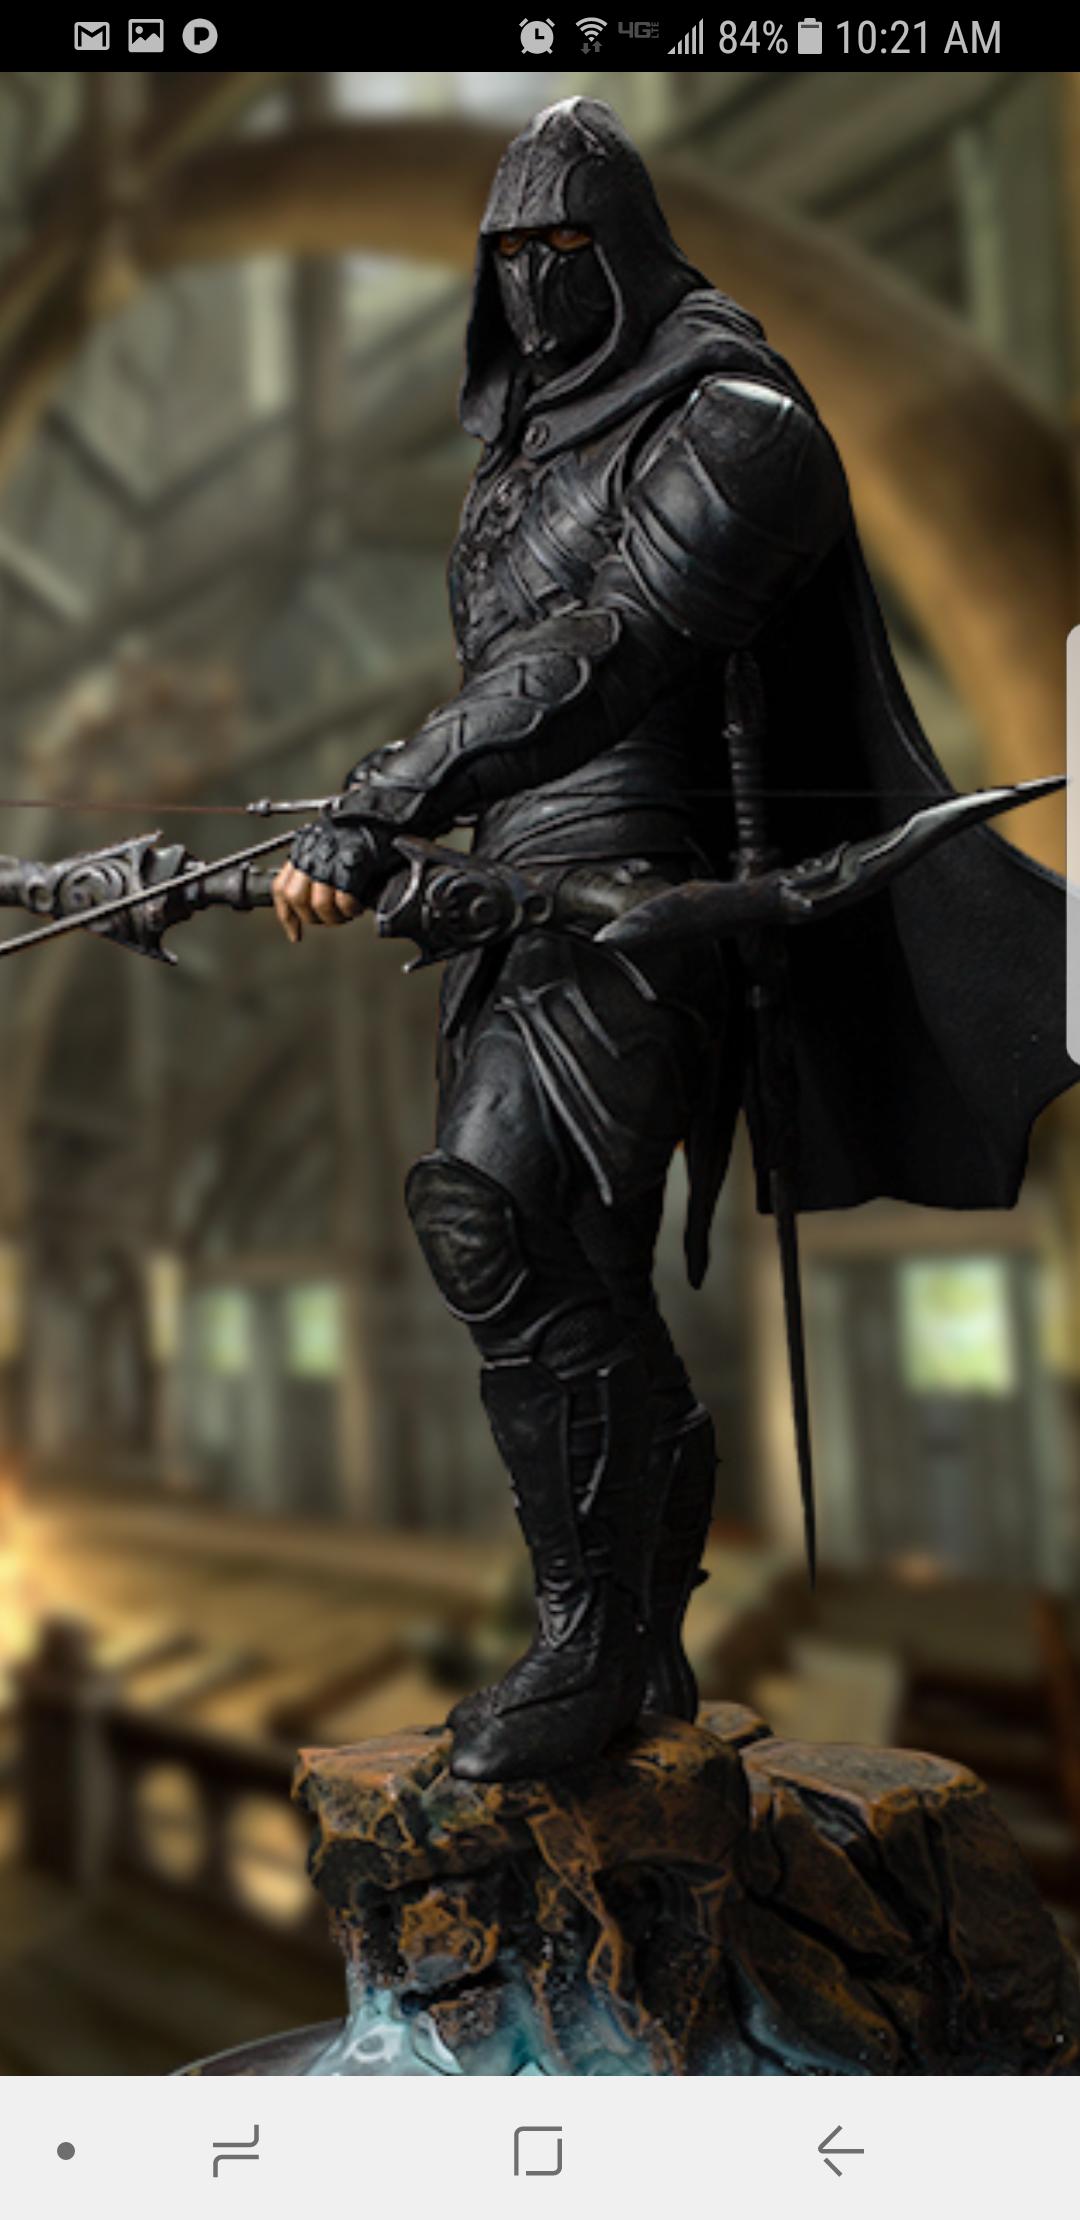 Duke's Skyrim Nightingale Armor | Halo Costume and Prop